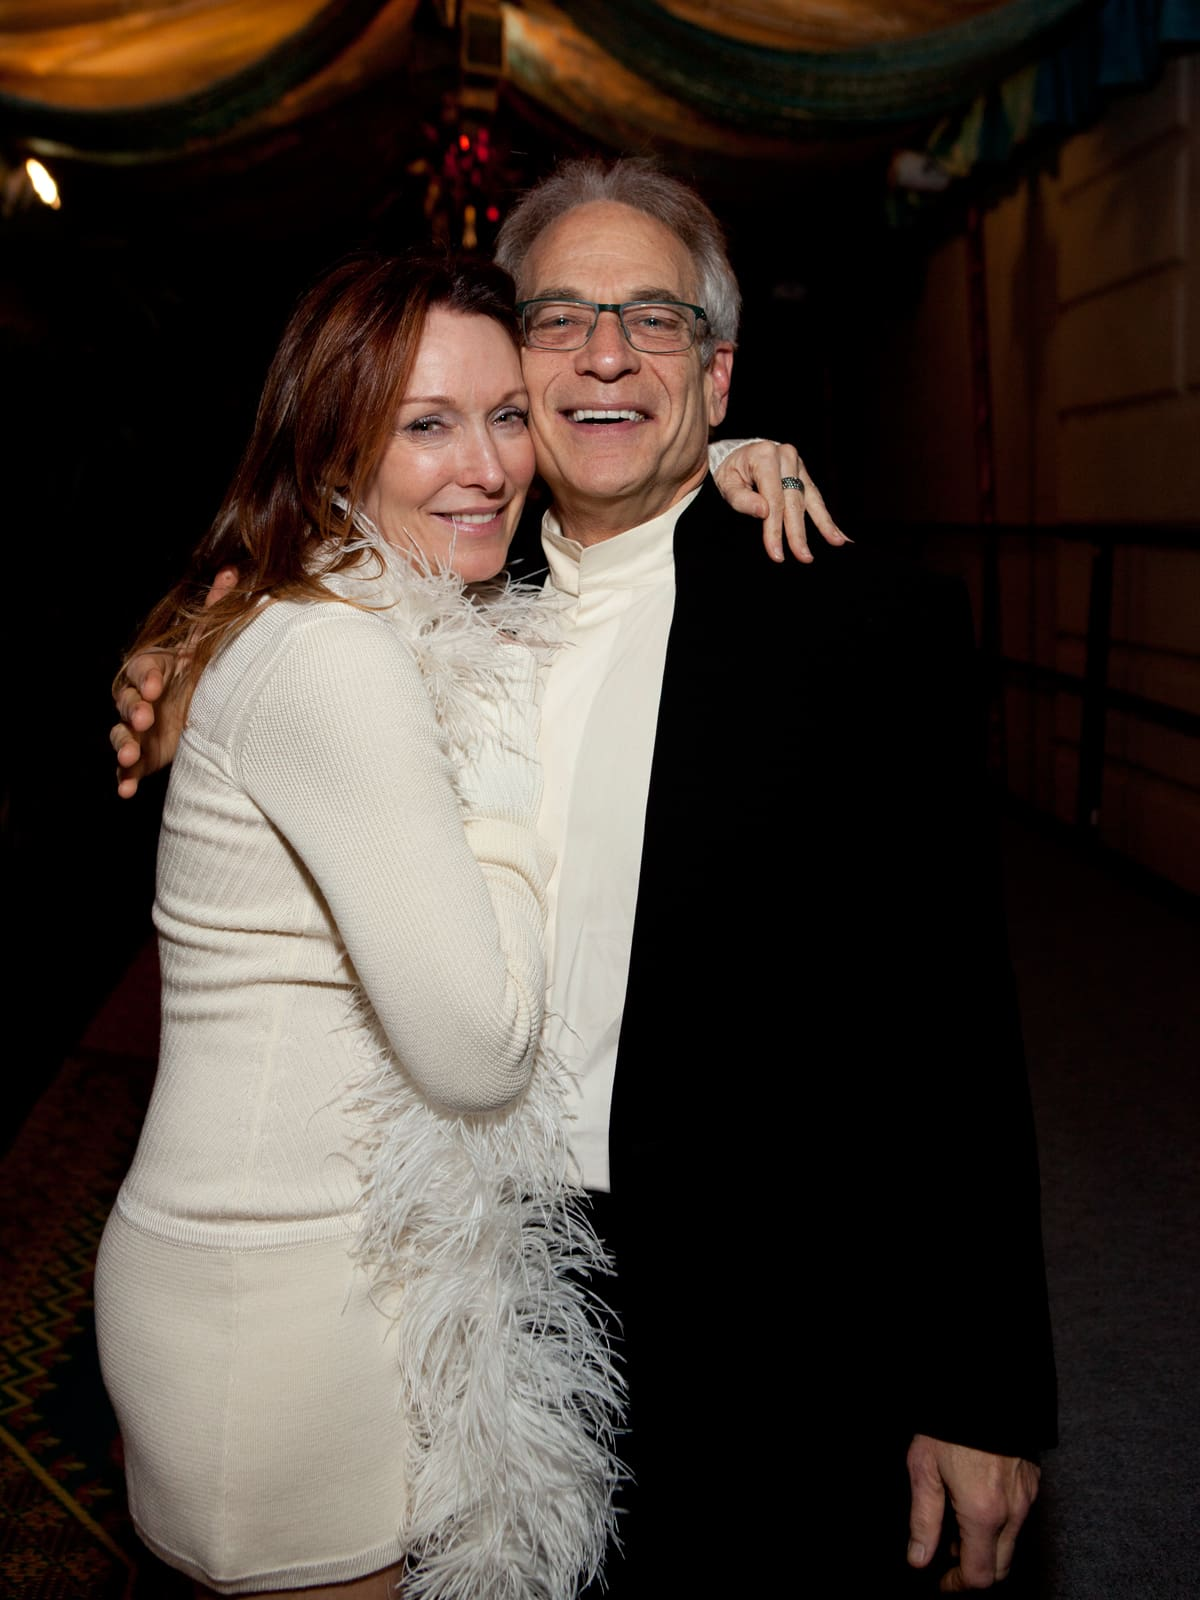 26 Holly Waltrip and Mickey Rosmarin at the Night Circus party January 2014